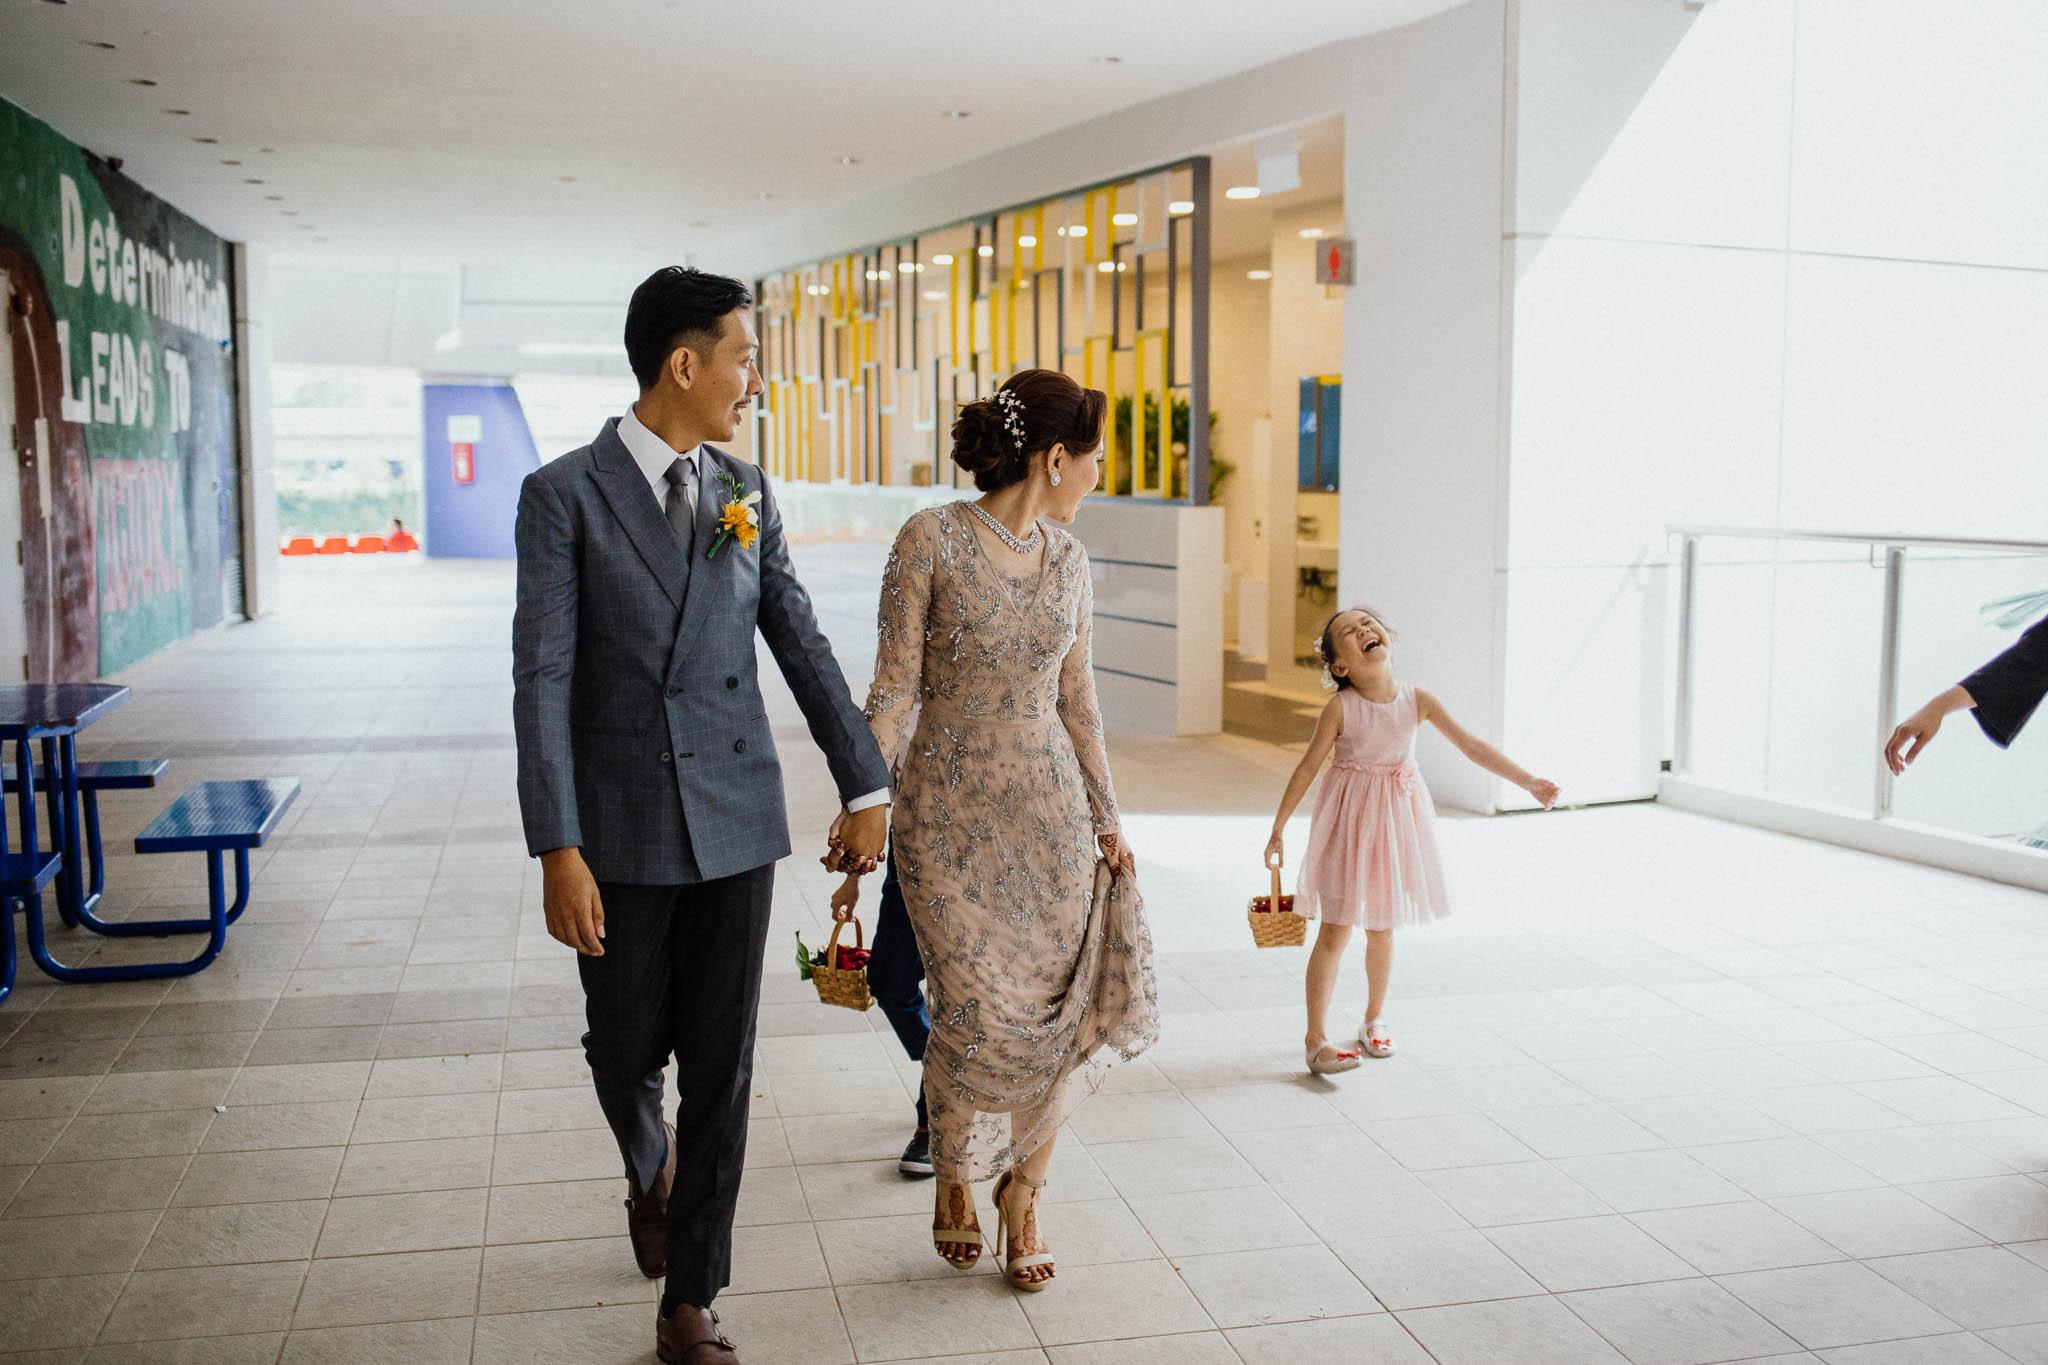 singapore-wedding-photographer-wedding-nufail-addafiq-041.jpg